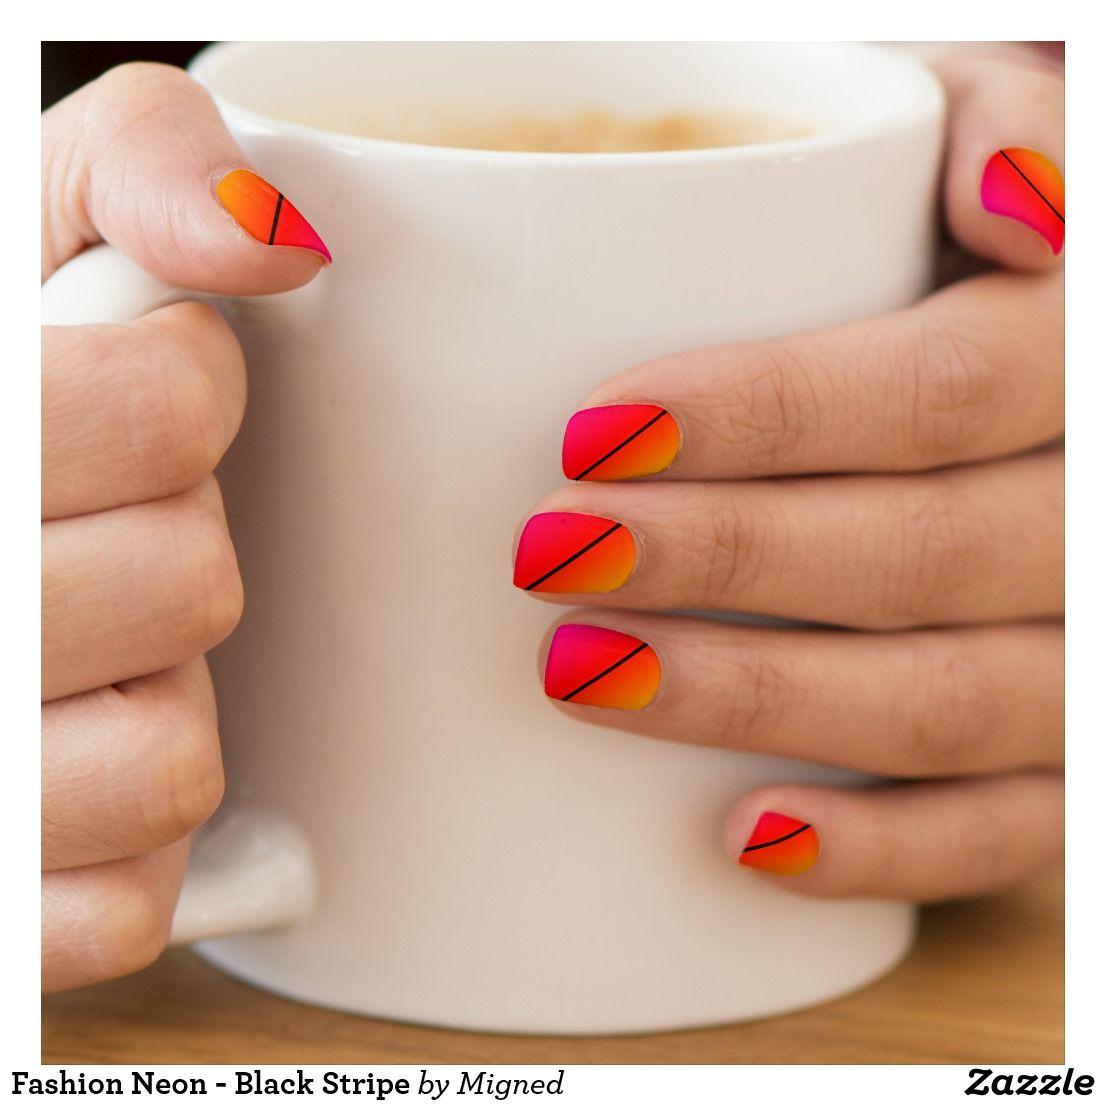 Fashion Neon - Black Stripe Minx Nail Art | Zazzle.com